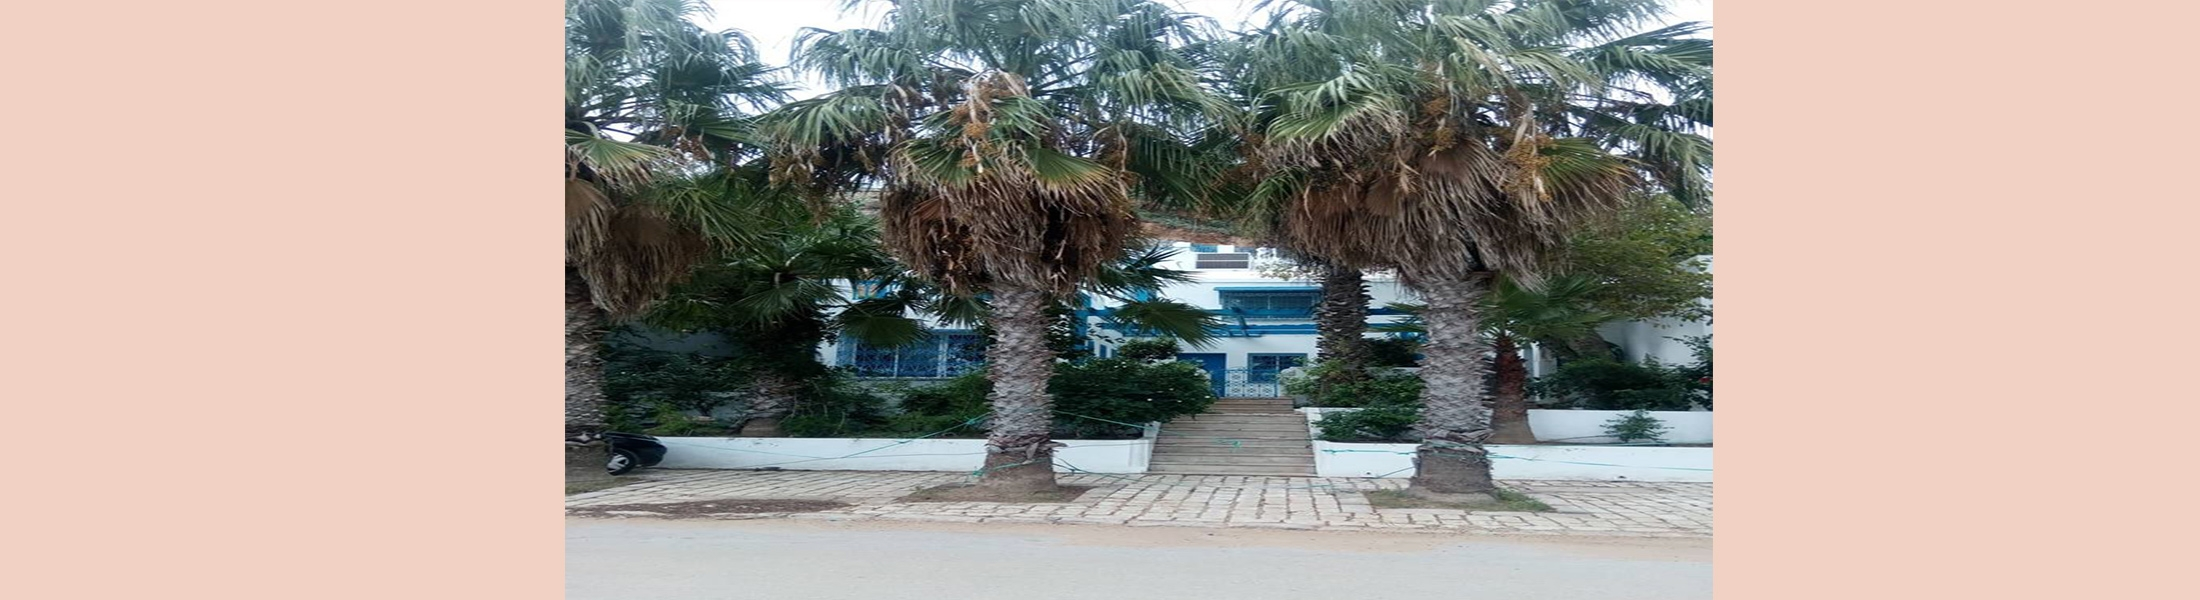 (01) villa Sise à la Résidence Al Marassi Sidi Bou Saïd - Tunis